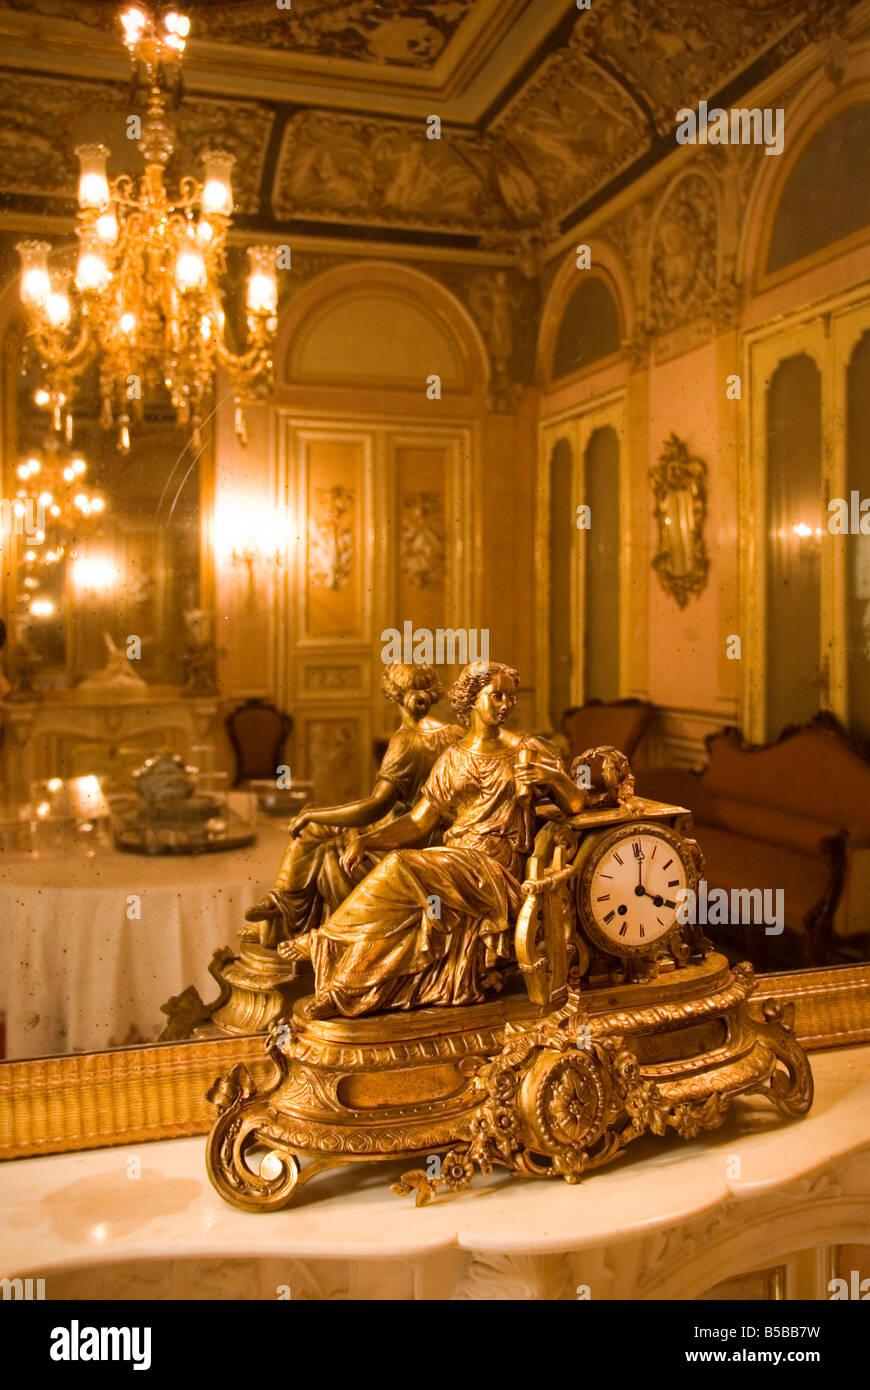 Golden Carriage Clock In Dining Room Comedor In The Palacio Del Marques De  Dos Aguas Which